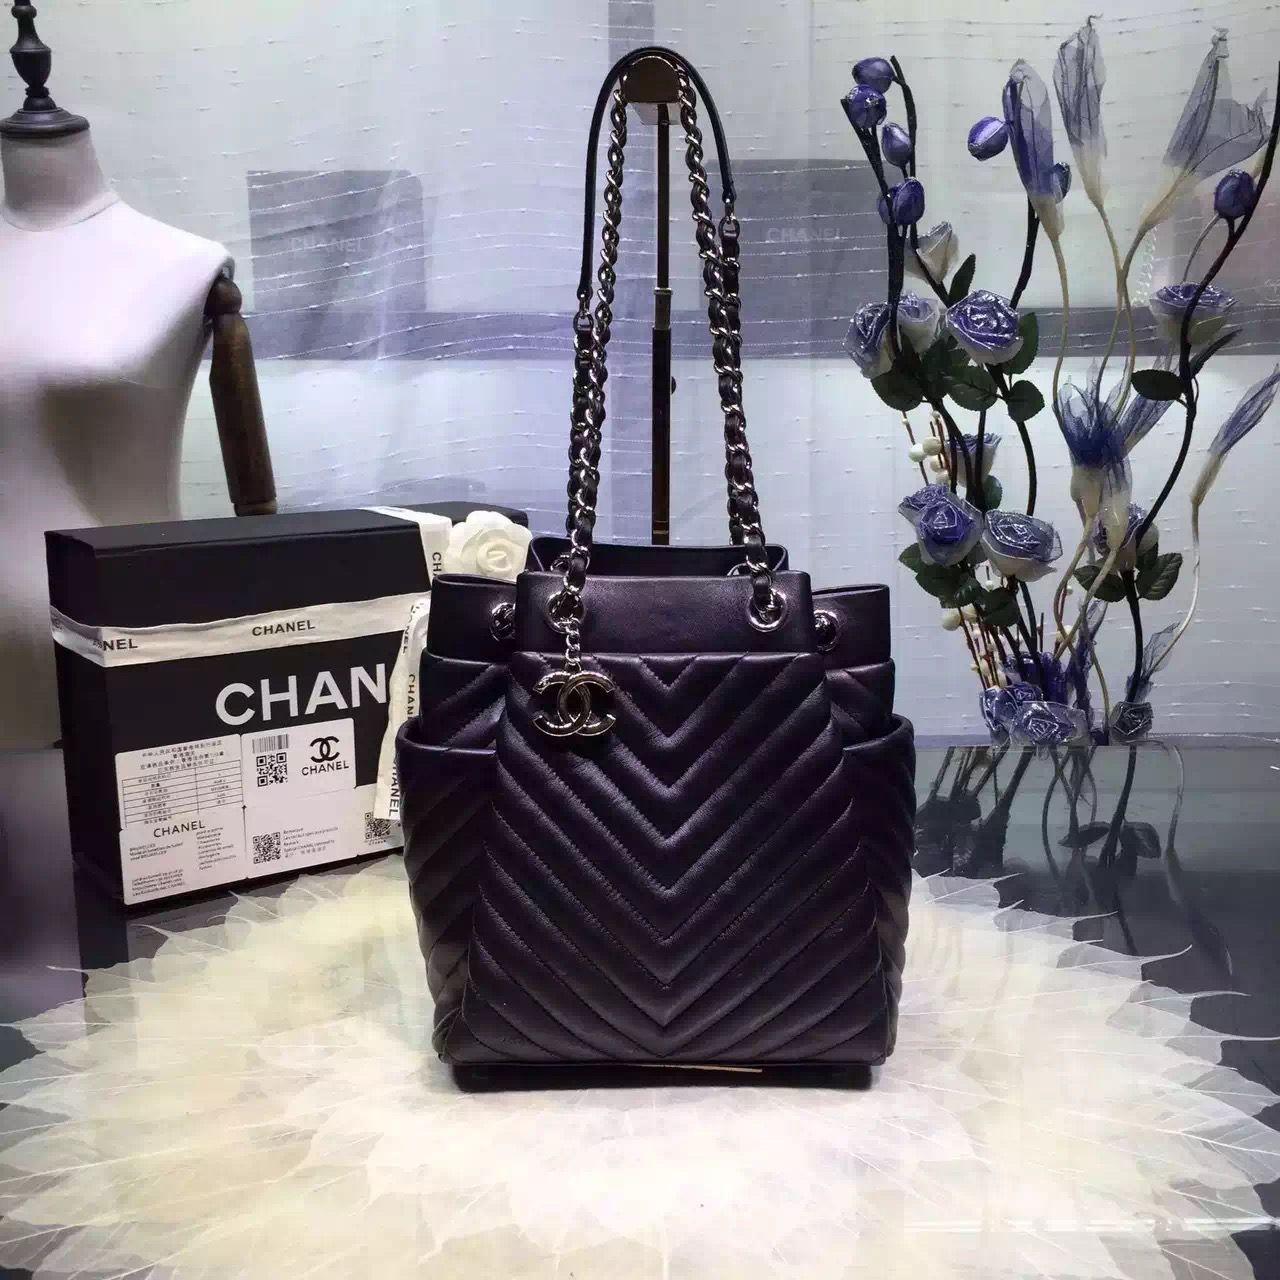 Chanel Small Drawstring Bag A91135 Spring-Summer 2016  3c6158129a1ad